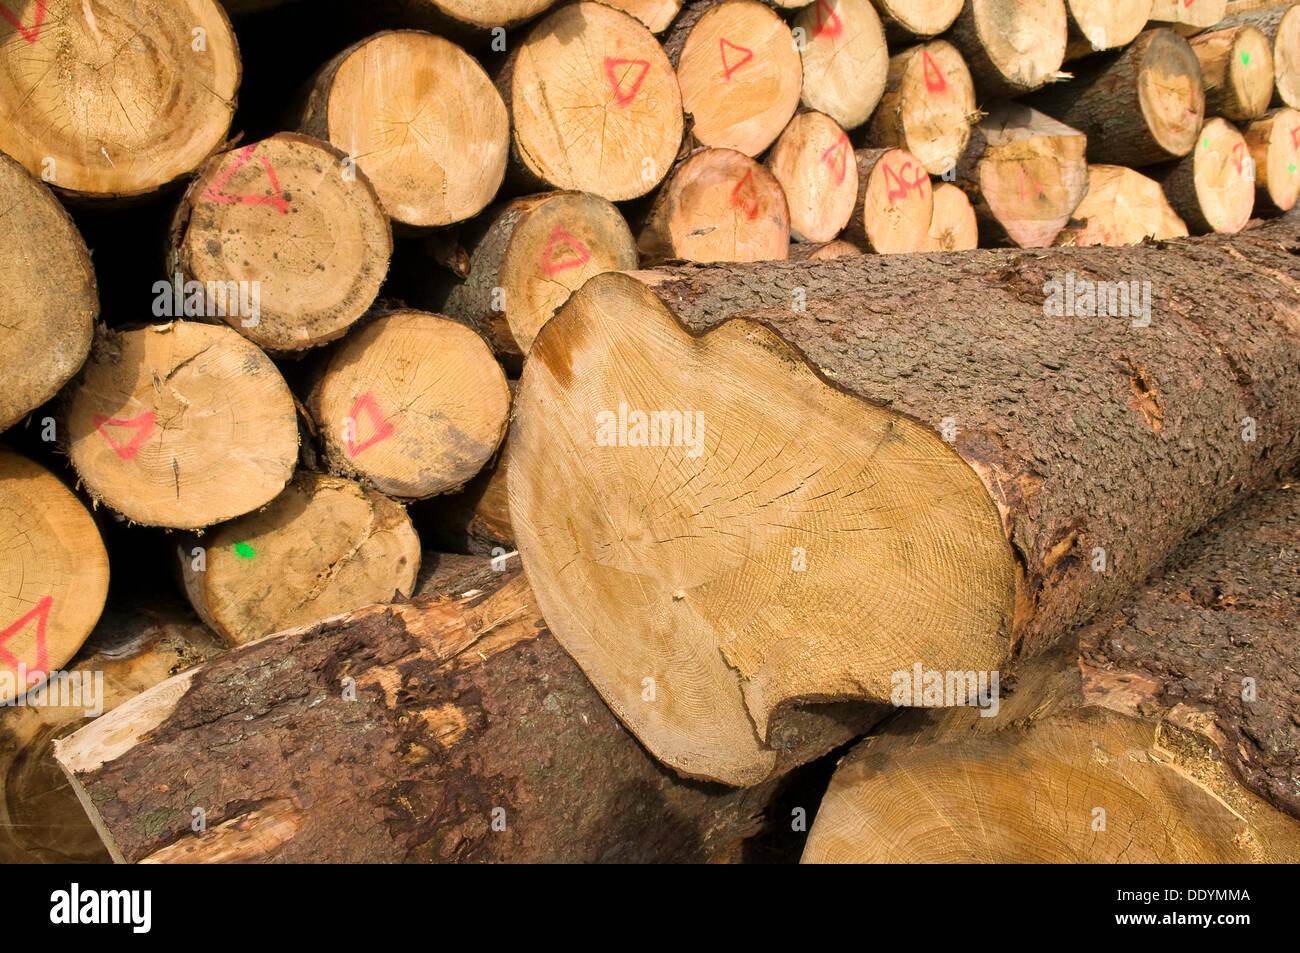 Sägewerk Holzhandel Protokolle Holzlagerung Bauholz Vorarlberg